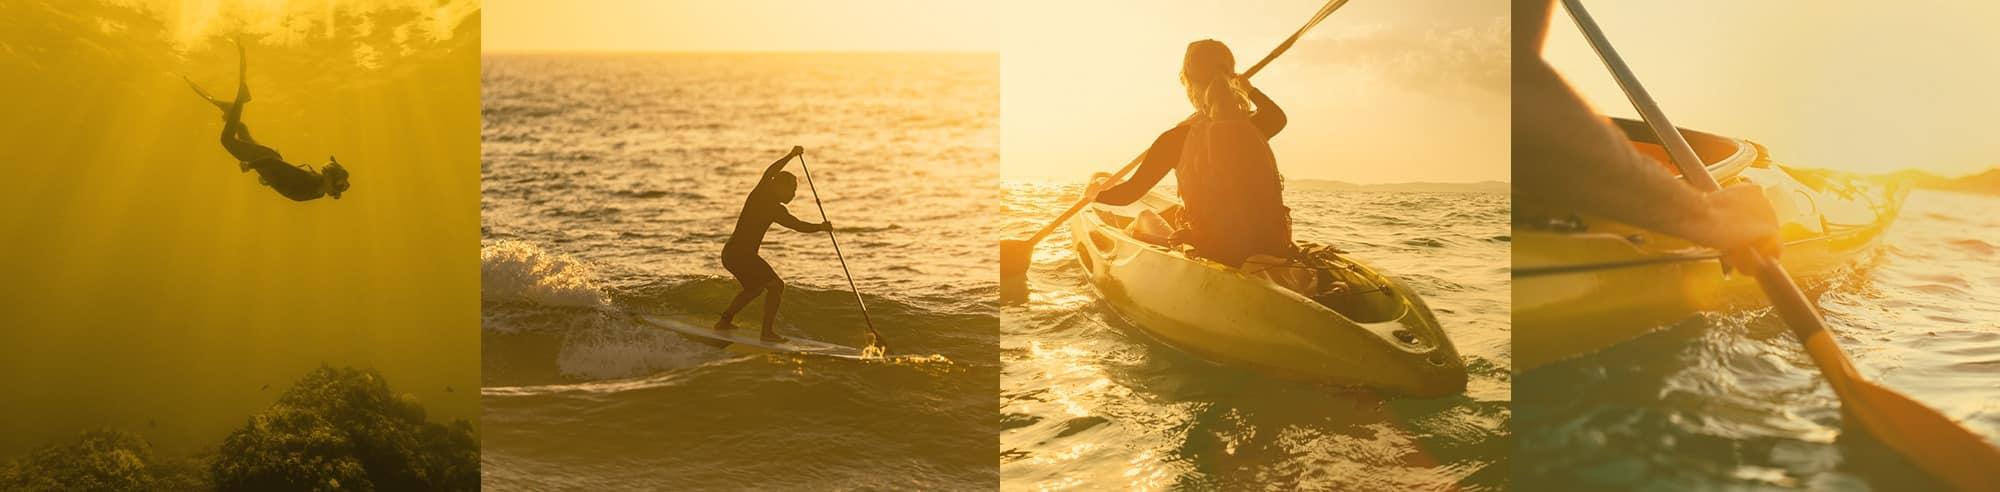 Sporty wodne bielizna BARE ExoWear ECN divers24.pl